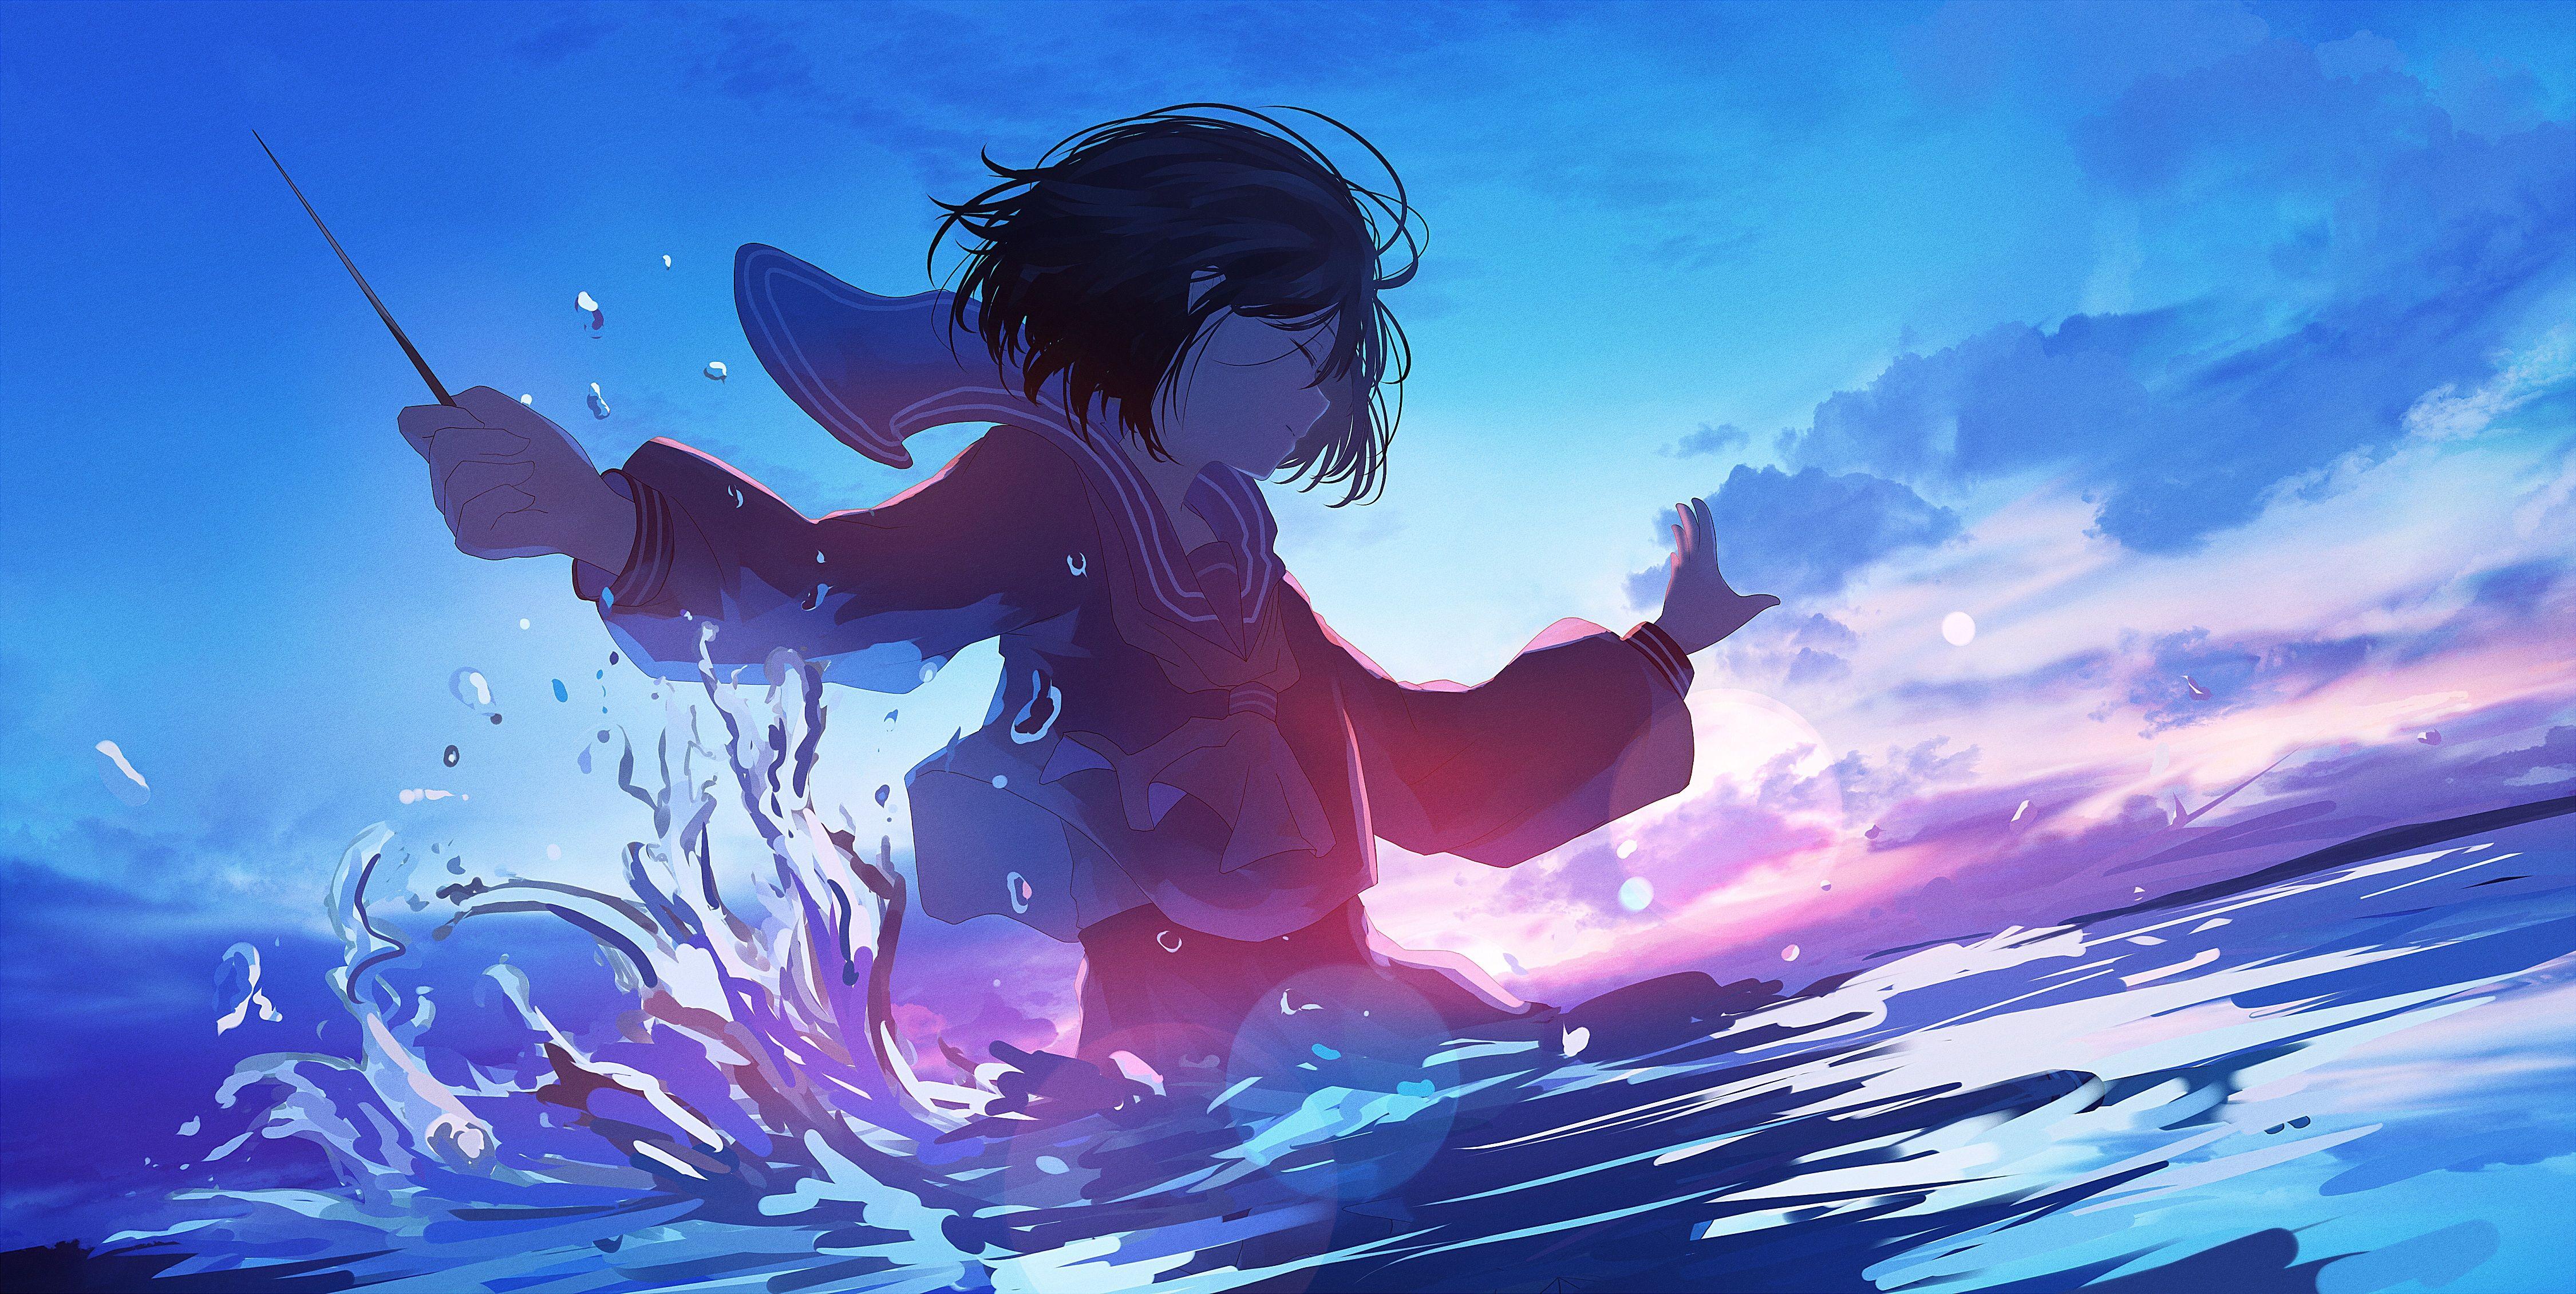 Romantic Anime Wallpaper 4k - Animeindo